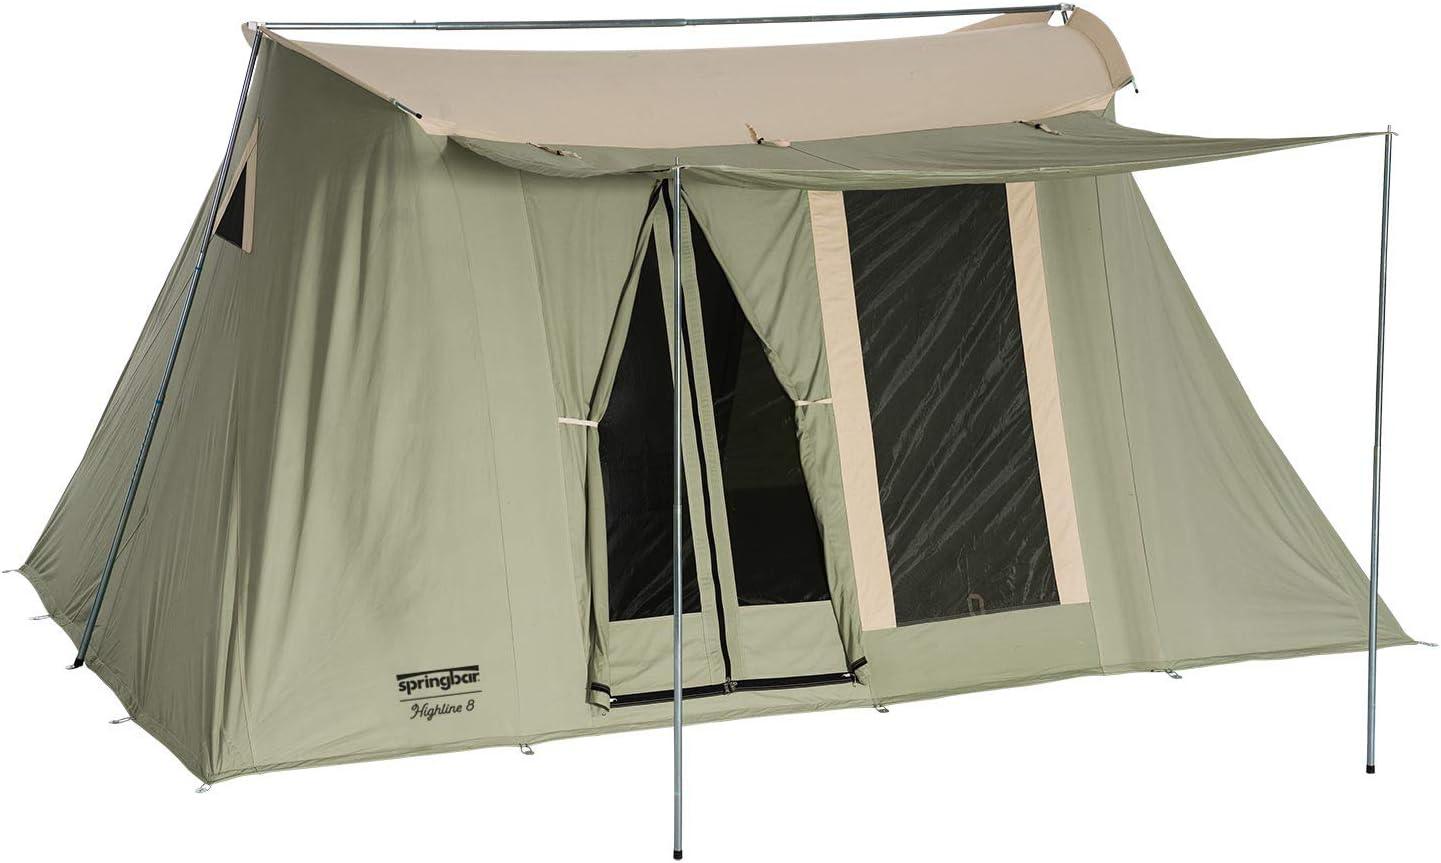 Springbar Highline 8 Tent Image